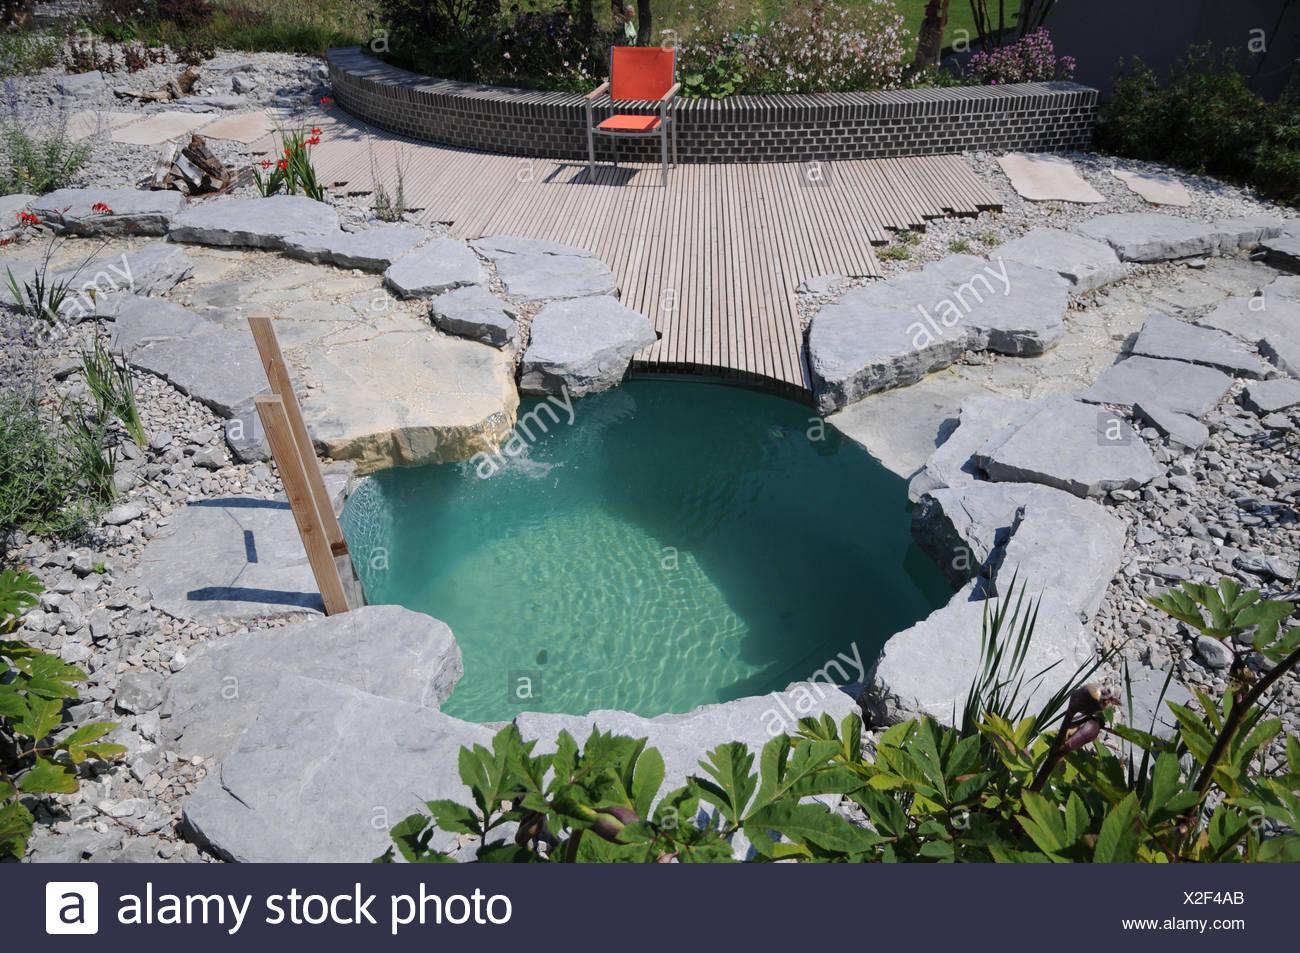 Natur Pool Stock Photo 276927907 Alamy